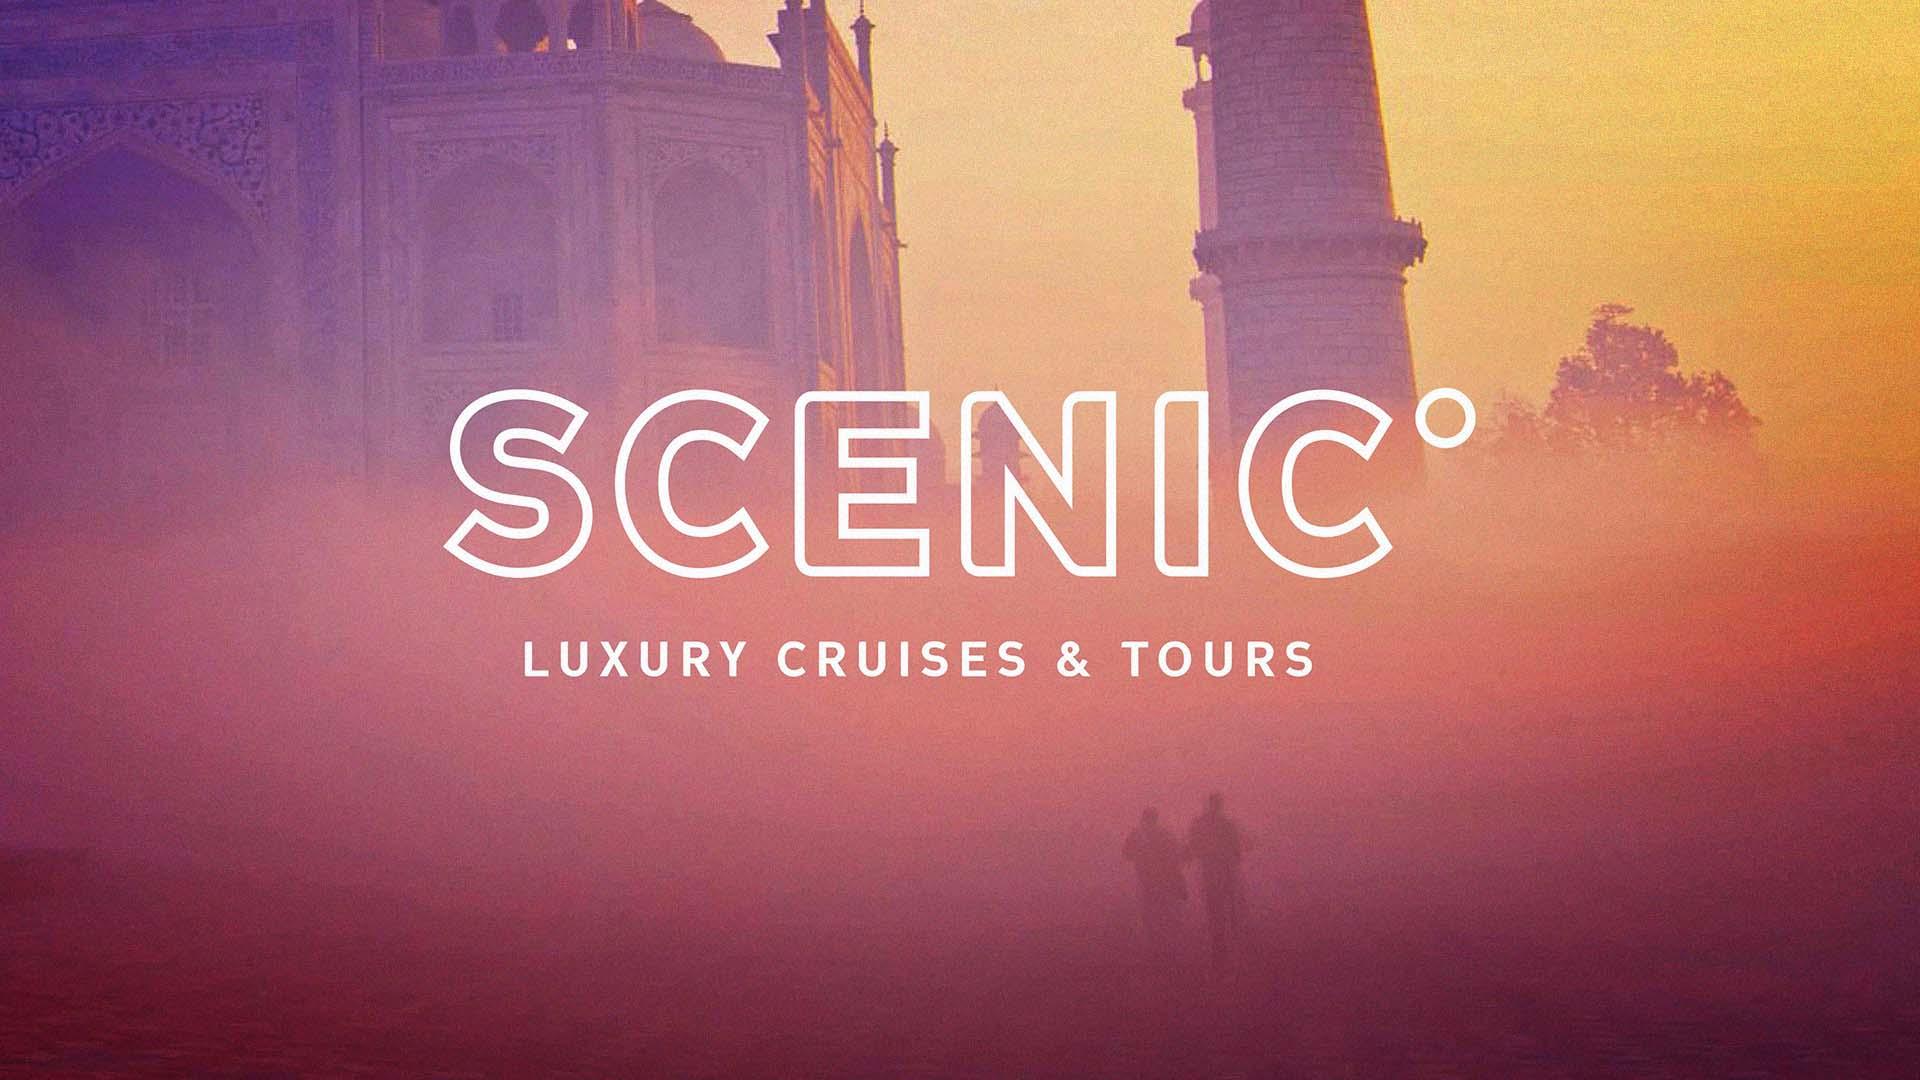 Scenic Diamond VR Tour